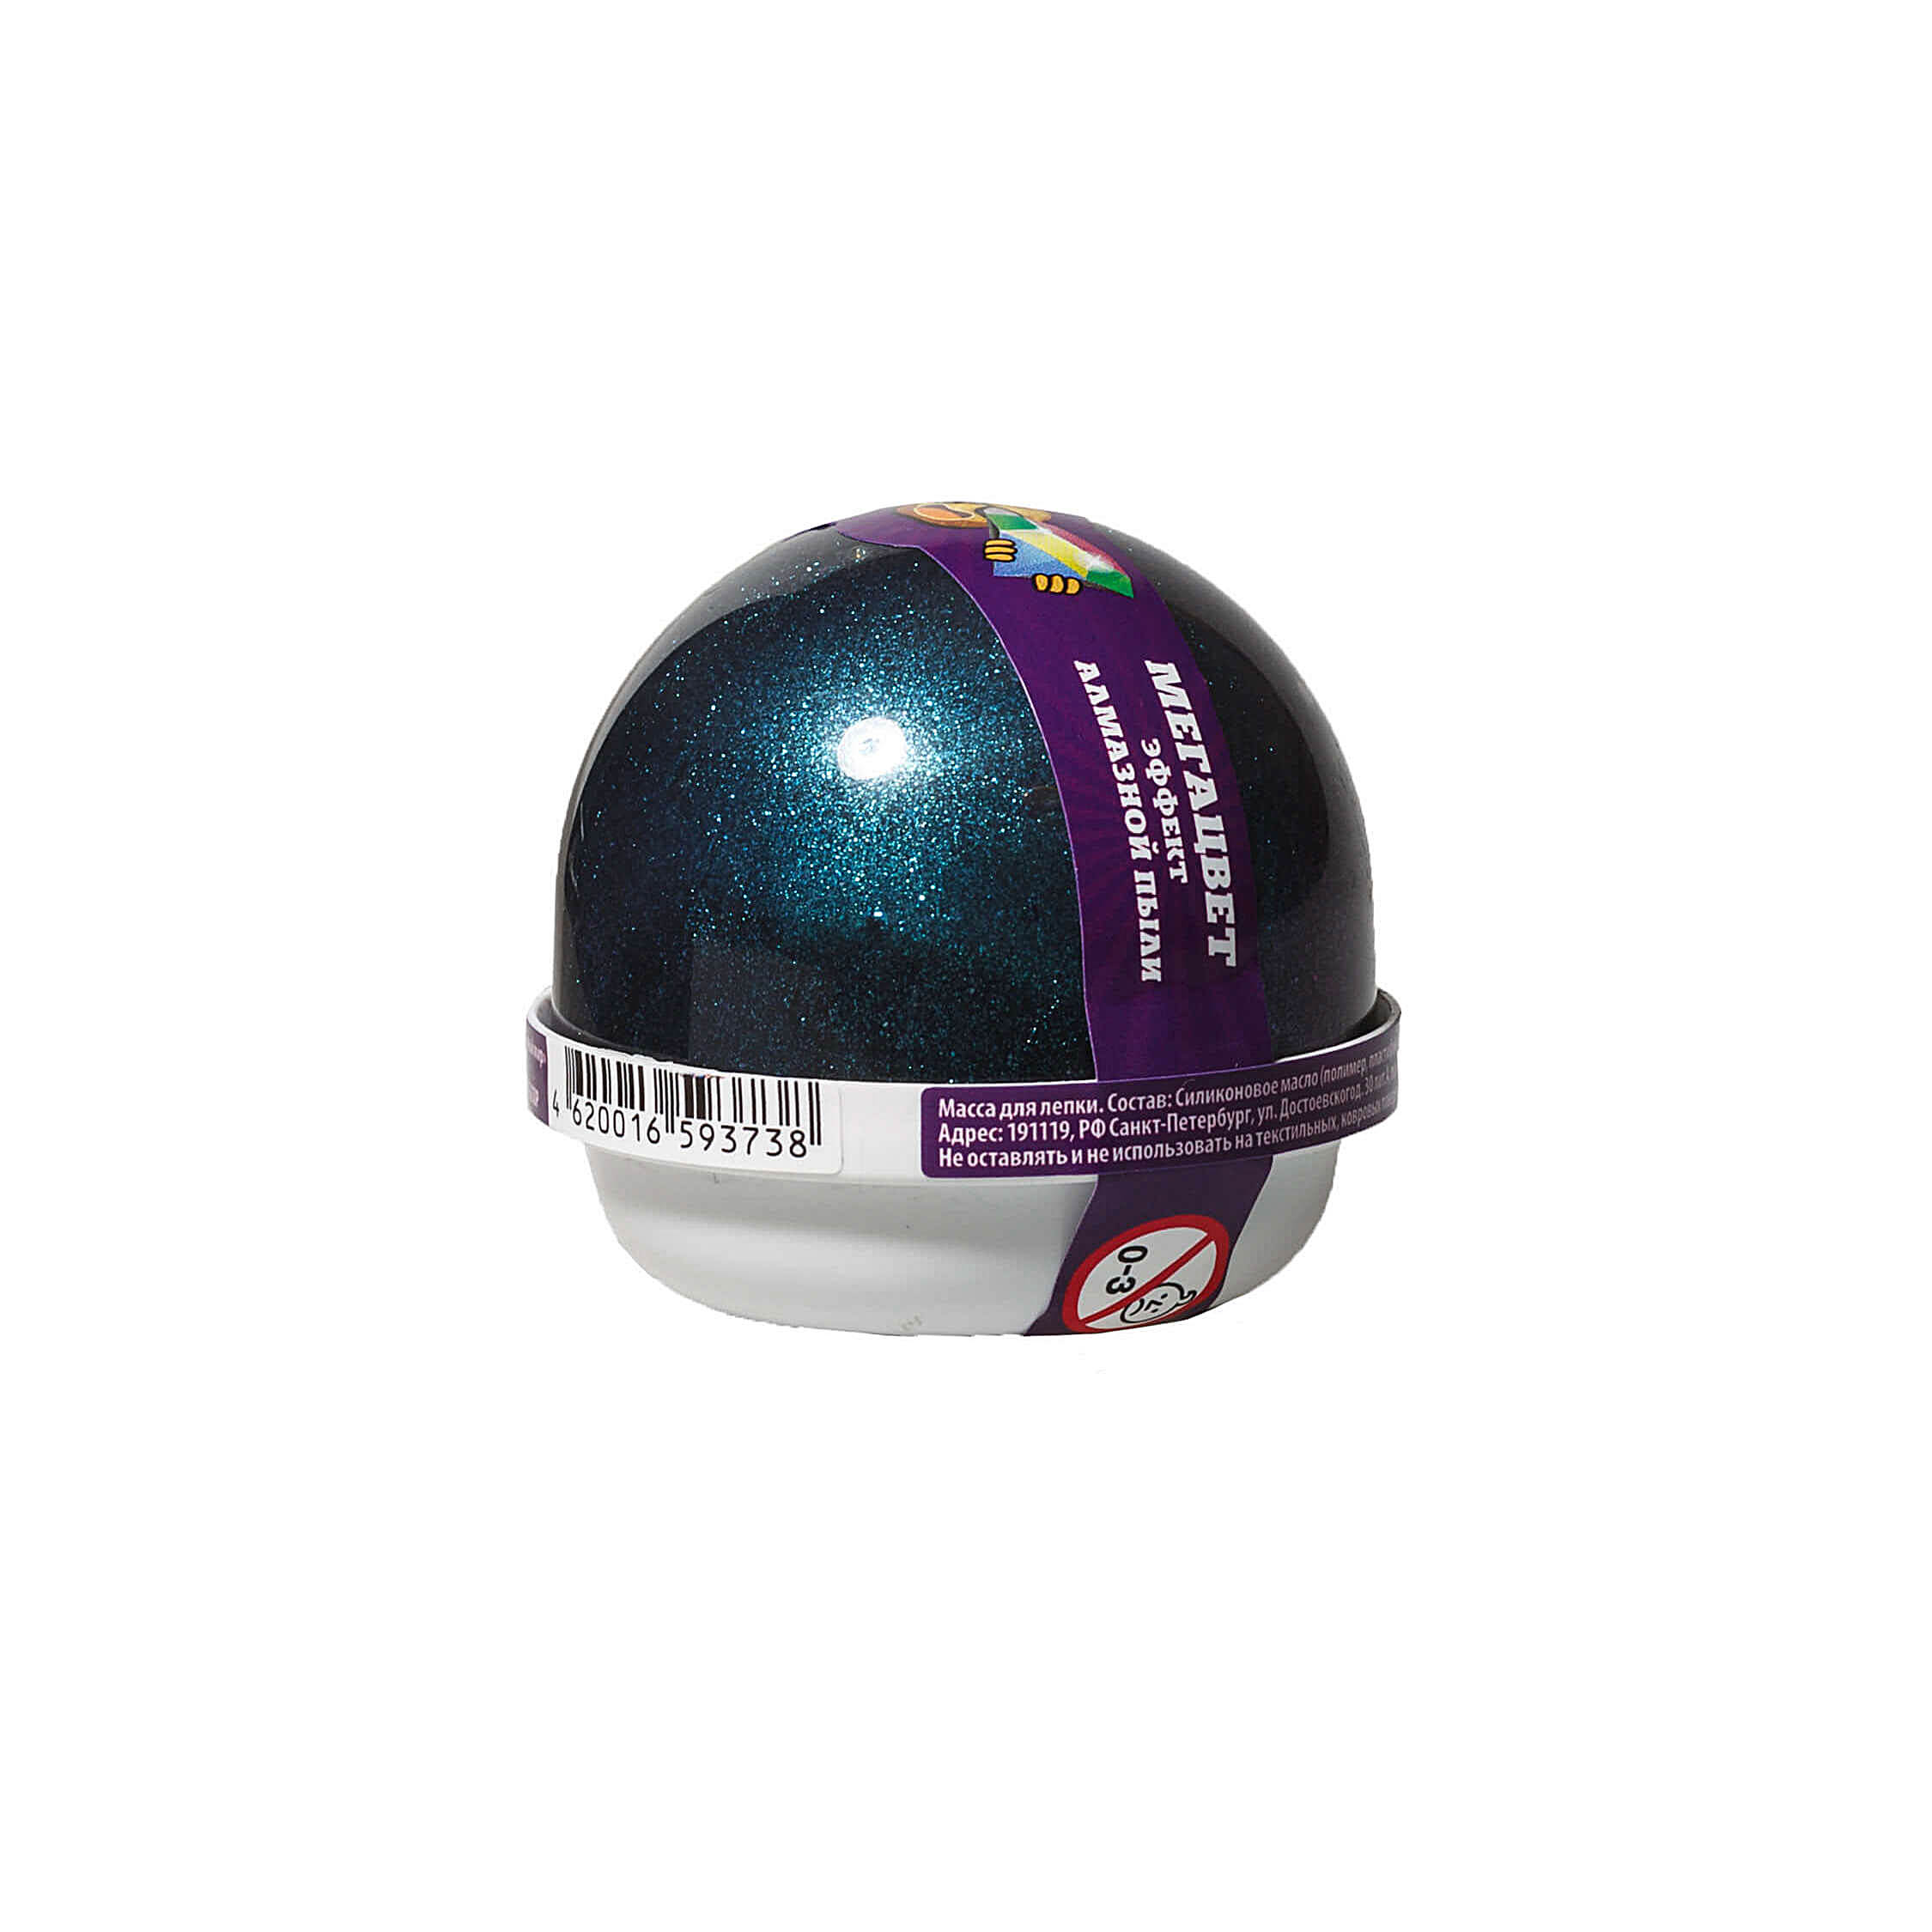 "NGCAP25 ""Жвачка для рук ""Nano gum"", эффект алмазной пыли"", 25 гр."